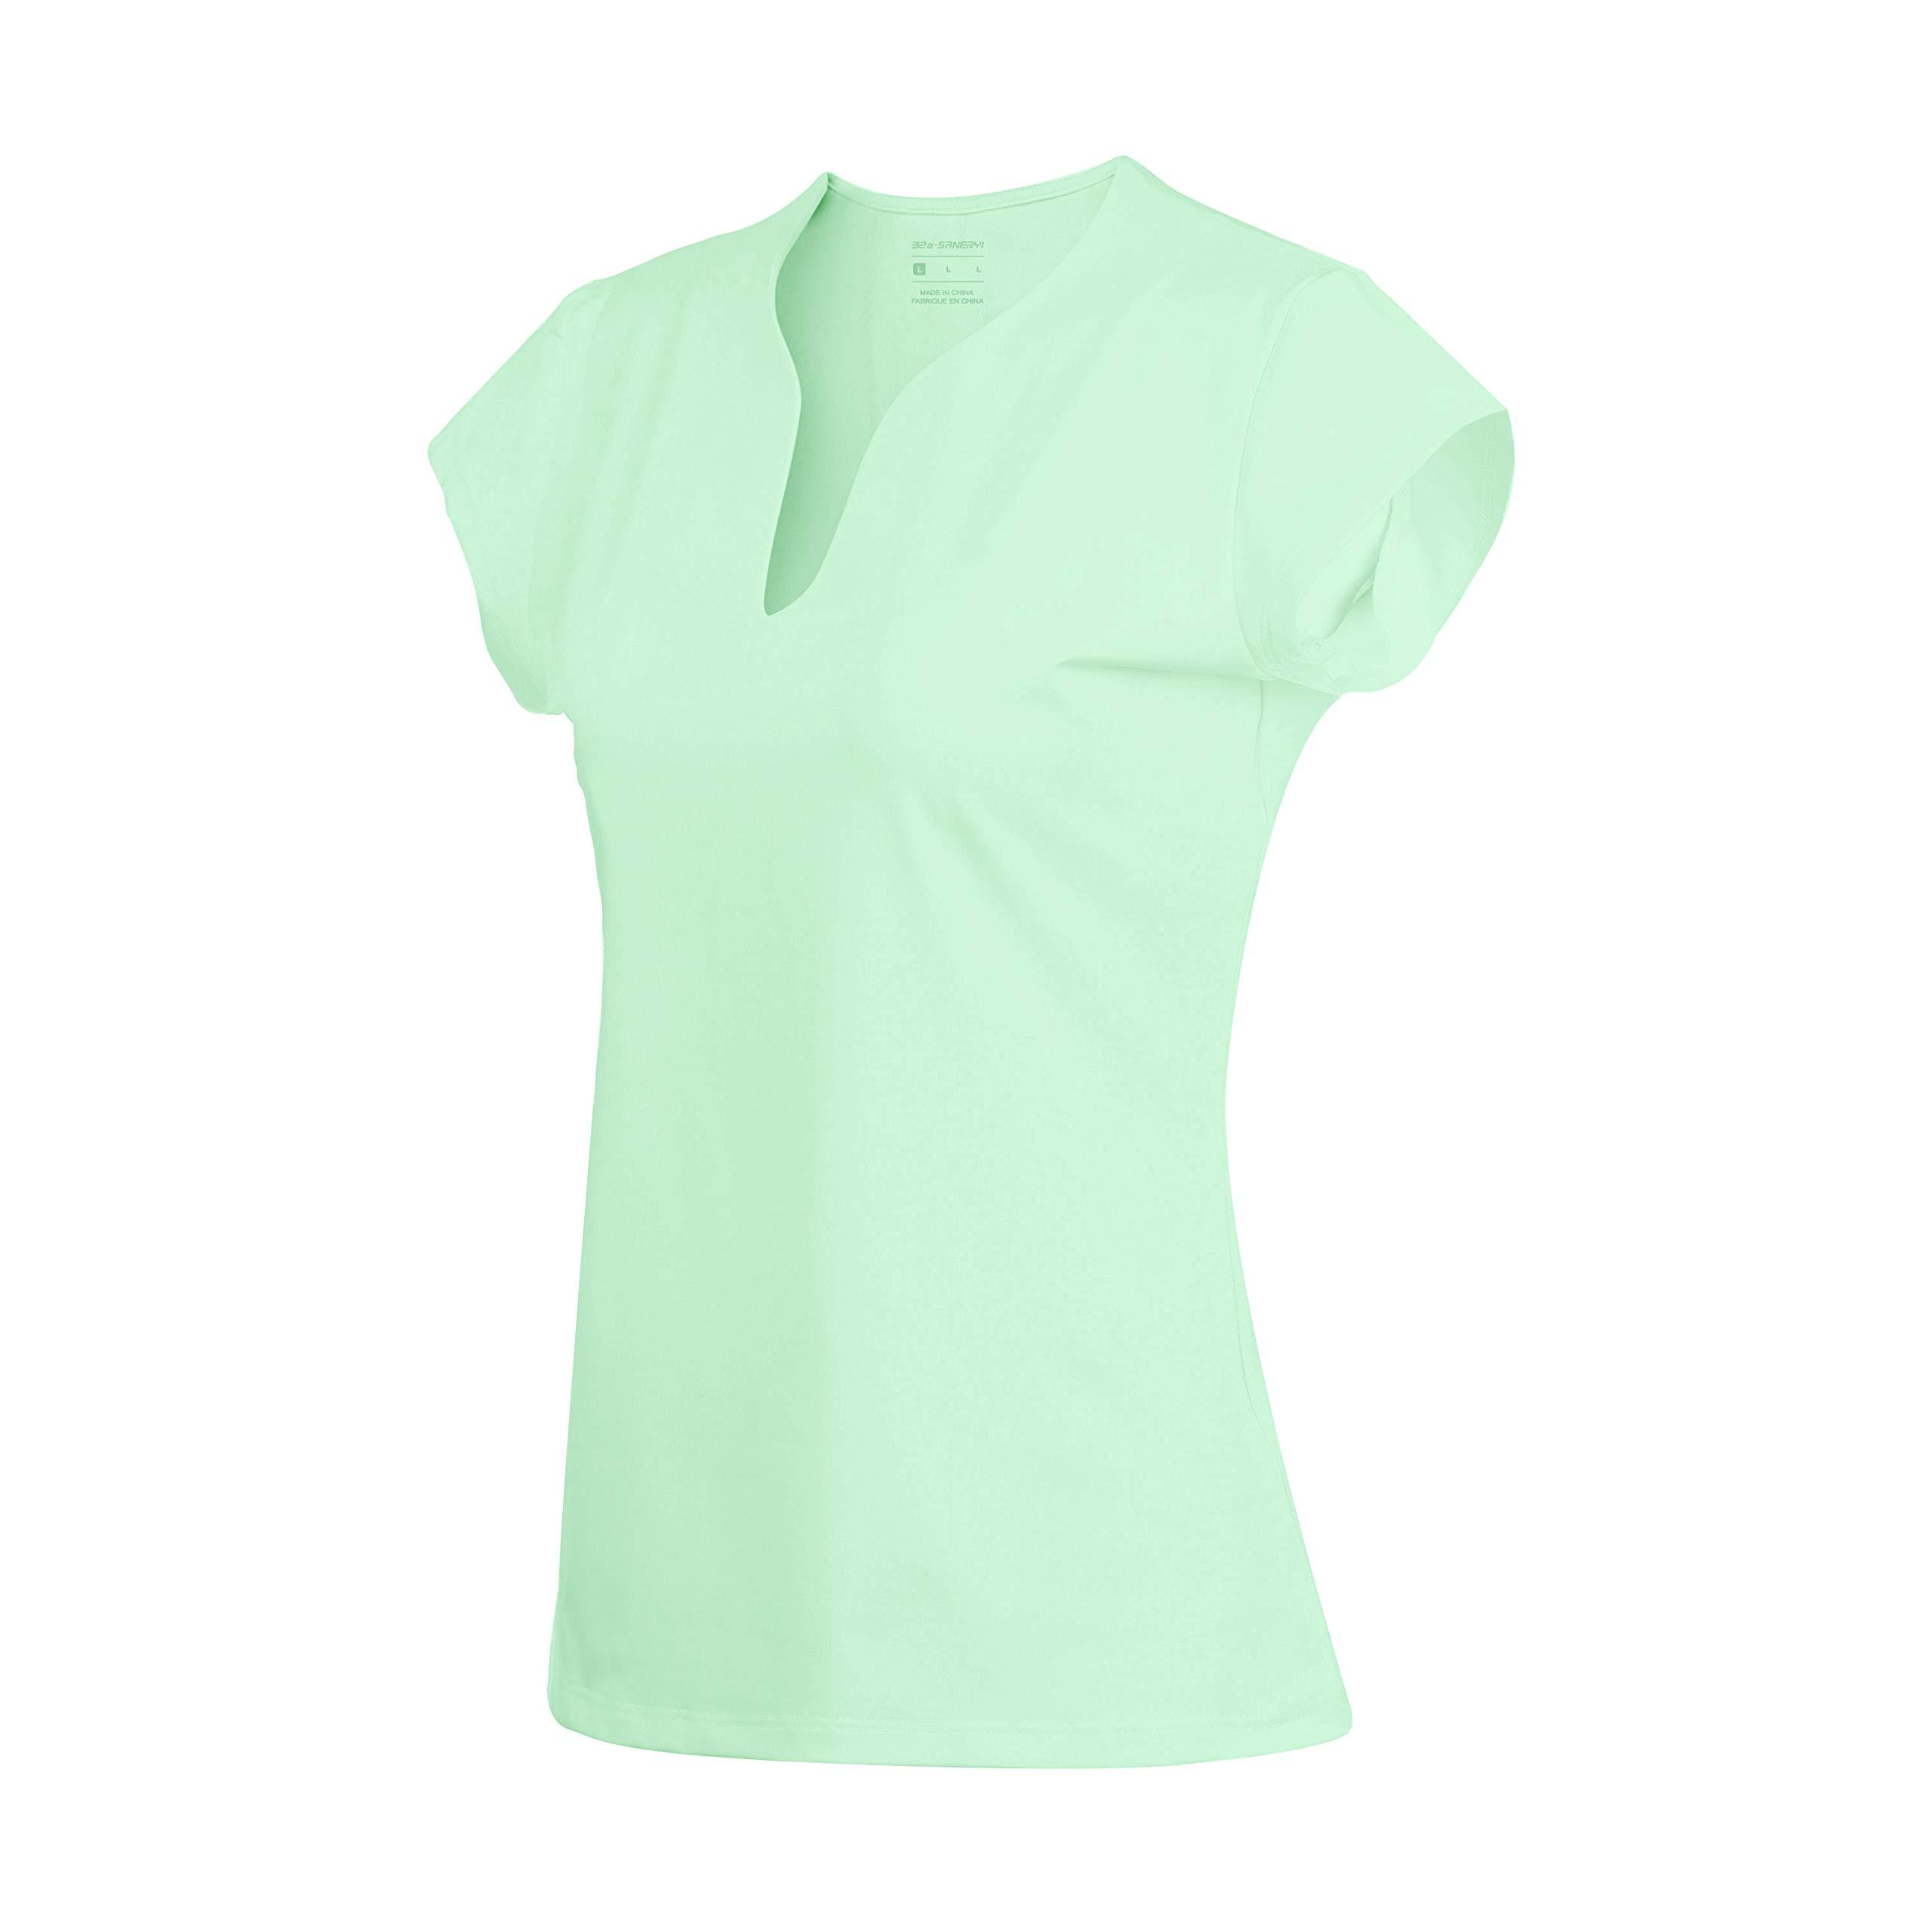 32e-SANERYI Women's V-Neck Pullover Short Sleeve Sports Shirts Quick-Drying Tees (M, Mint Green)